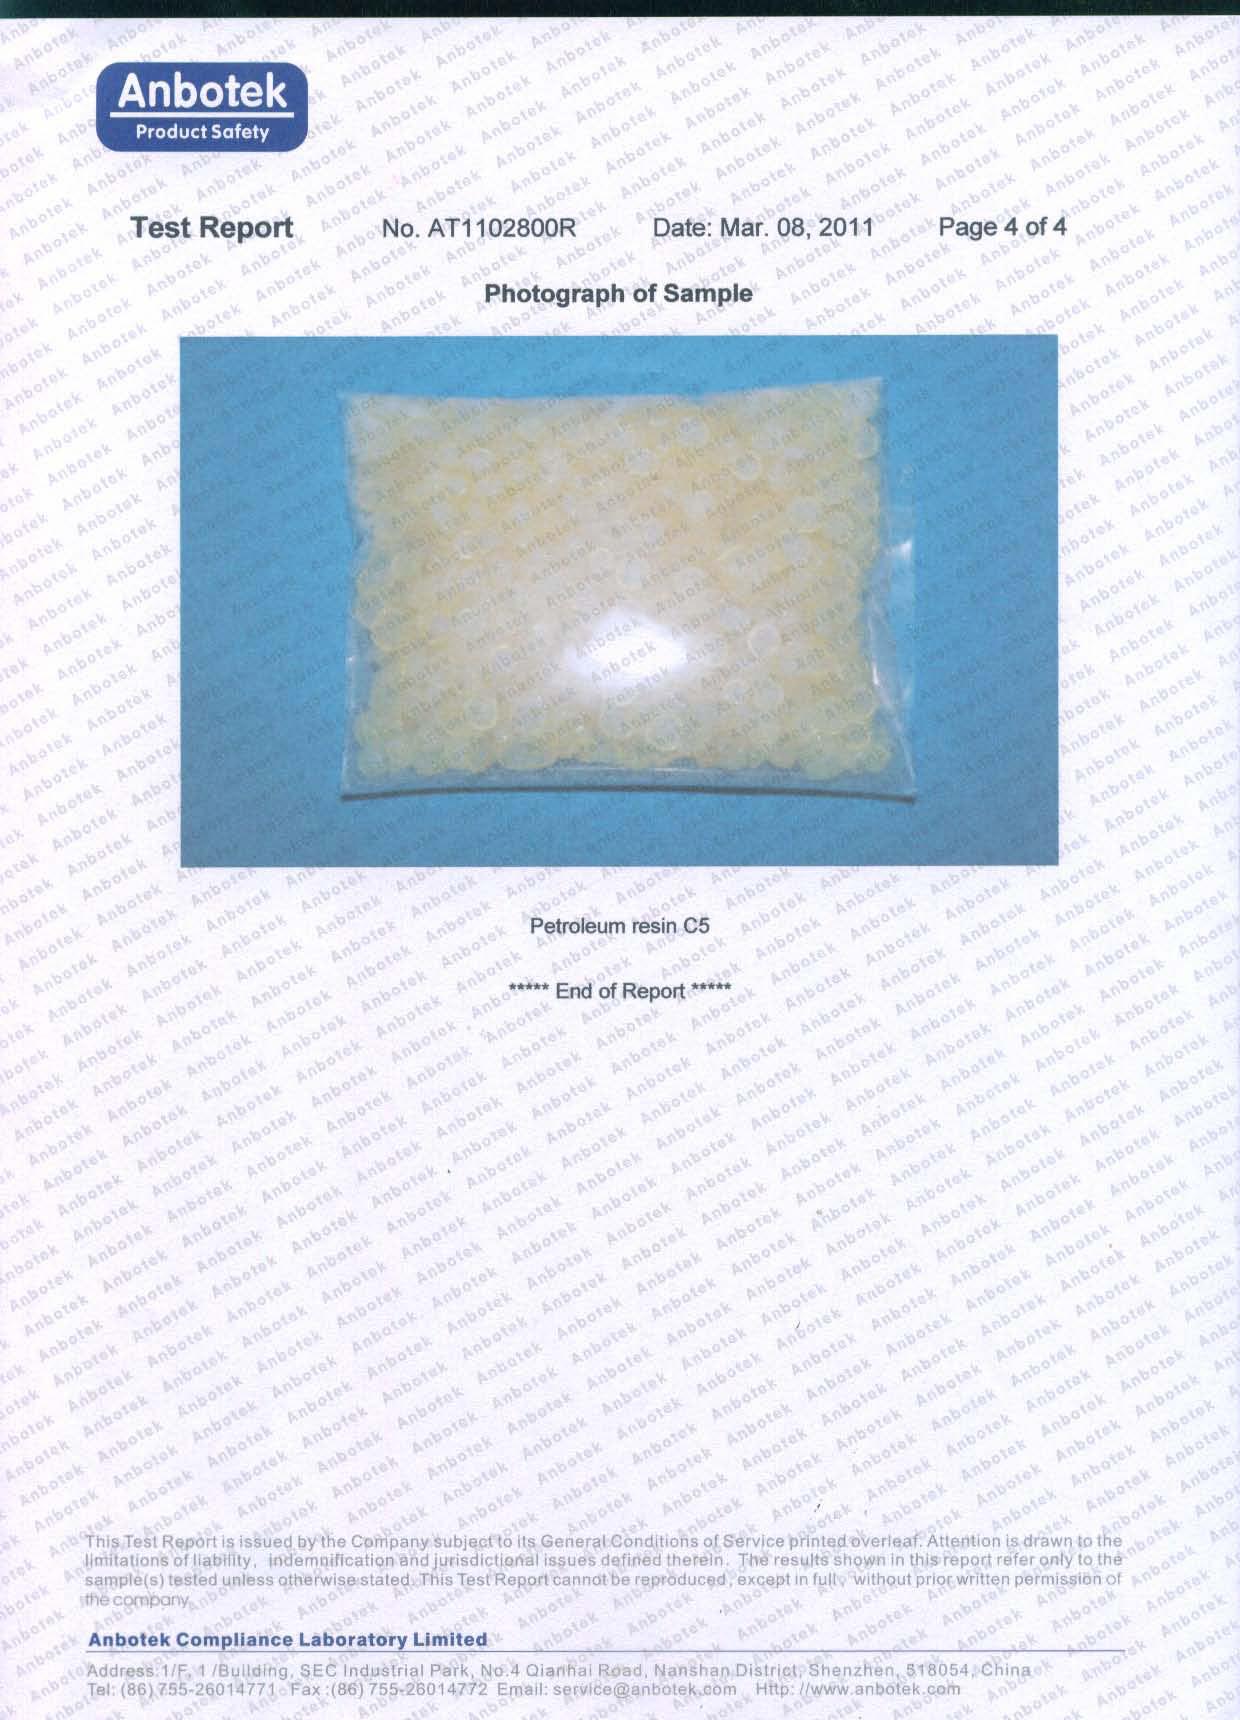 SG-5102 PAHs (page 4)